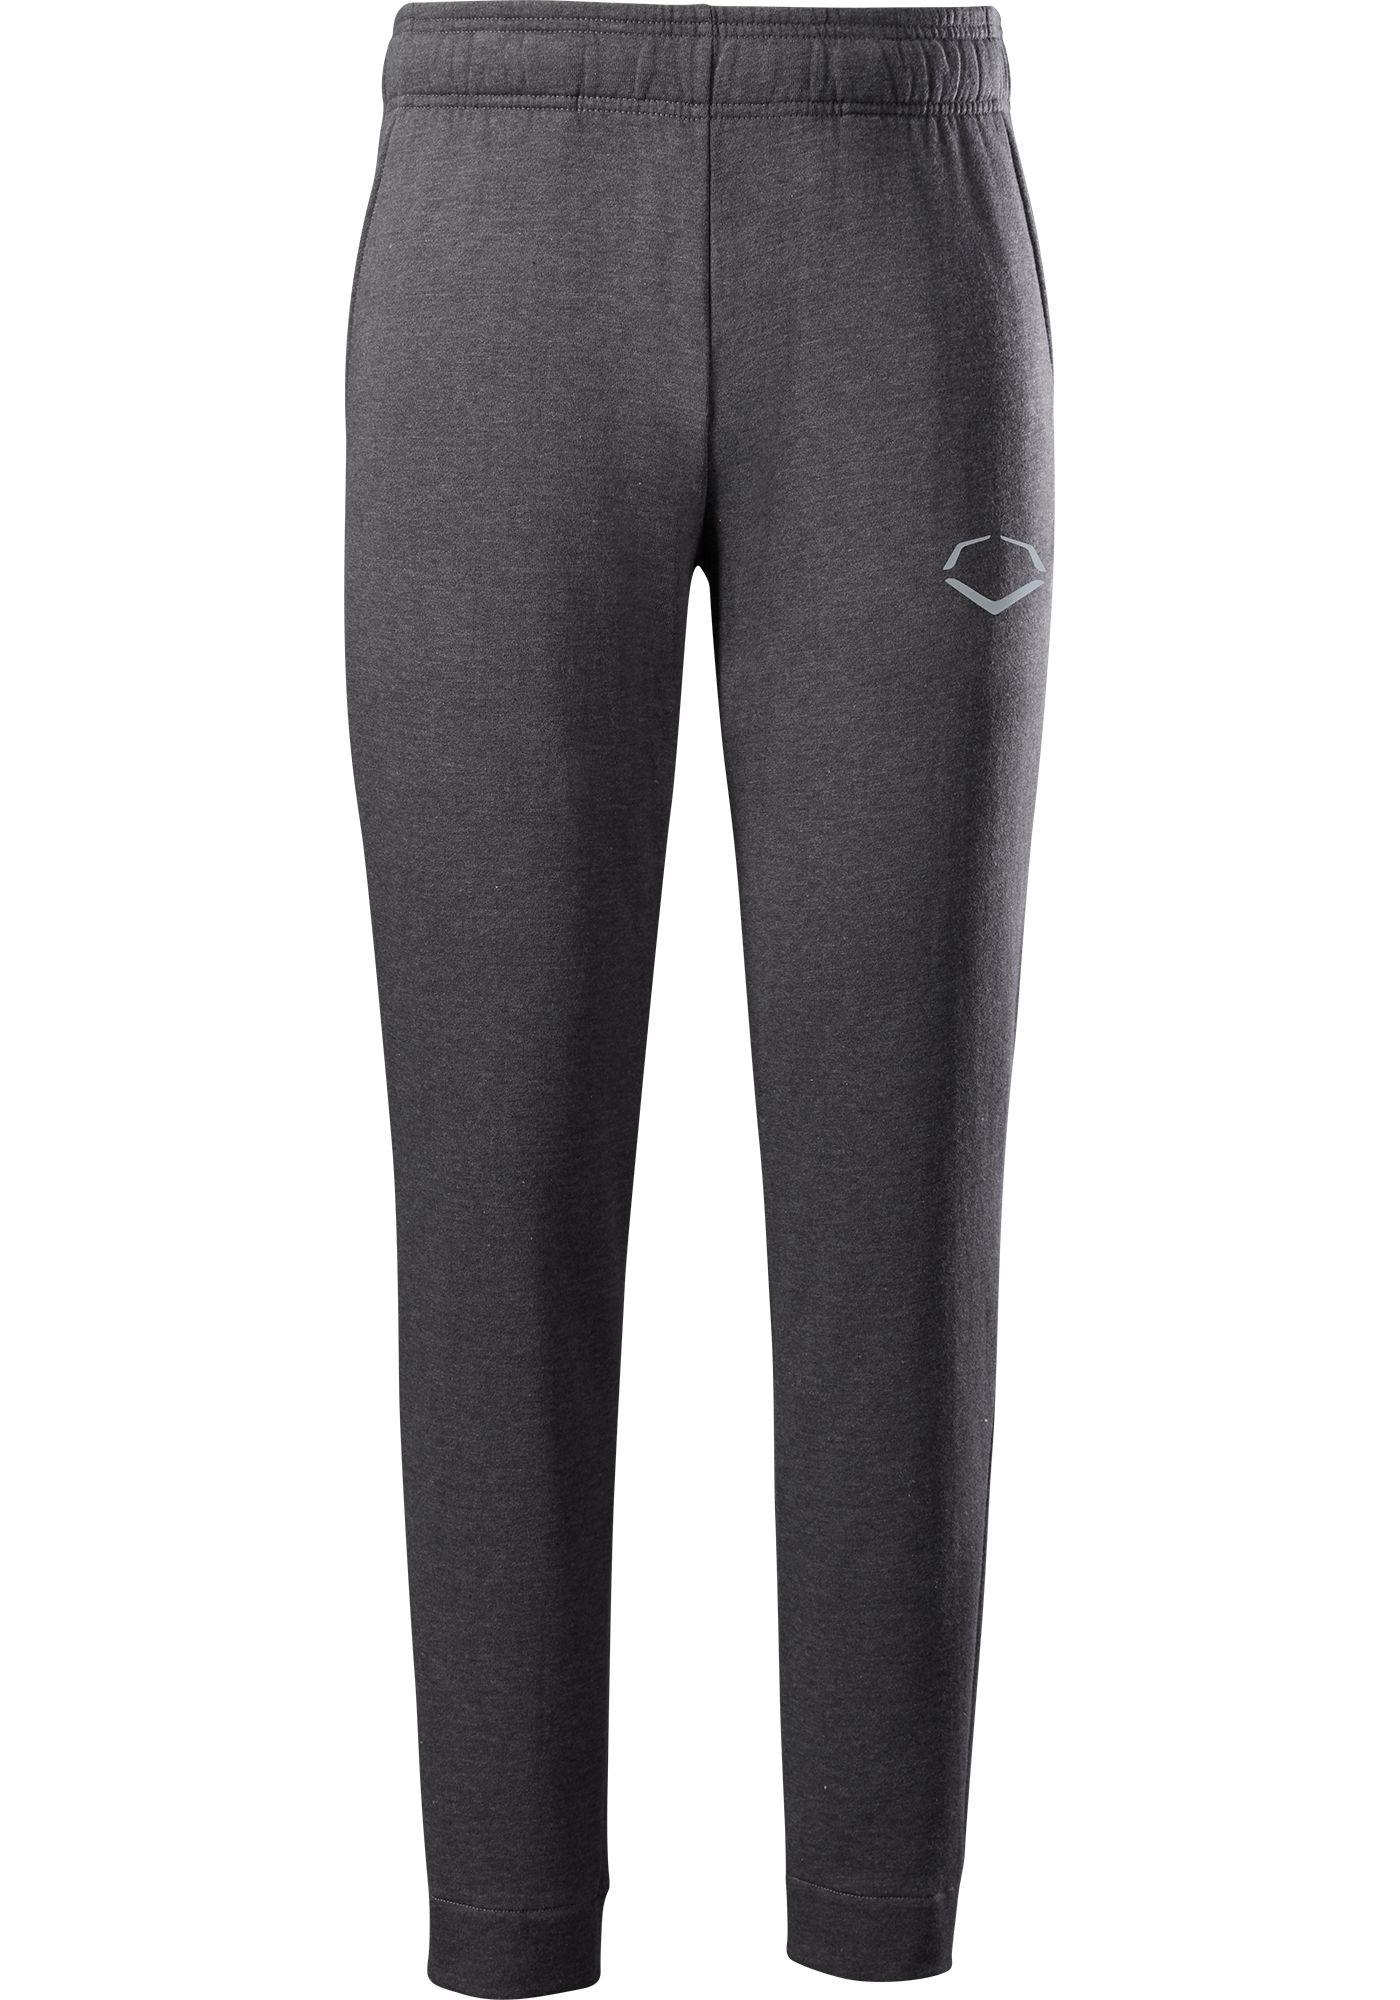 EvoShield Boys' Pro Team Fleece Pants